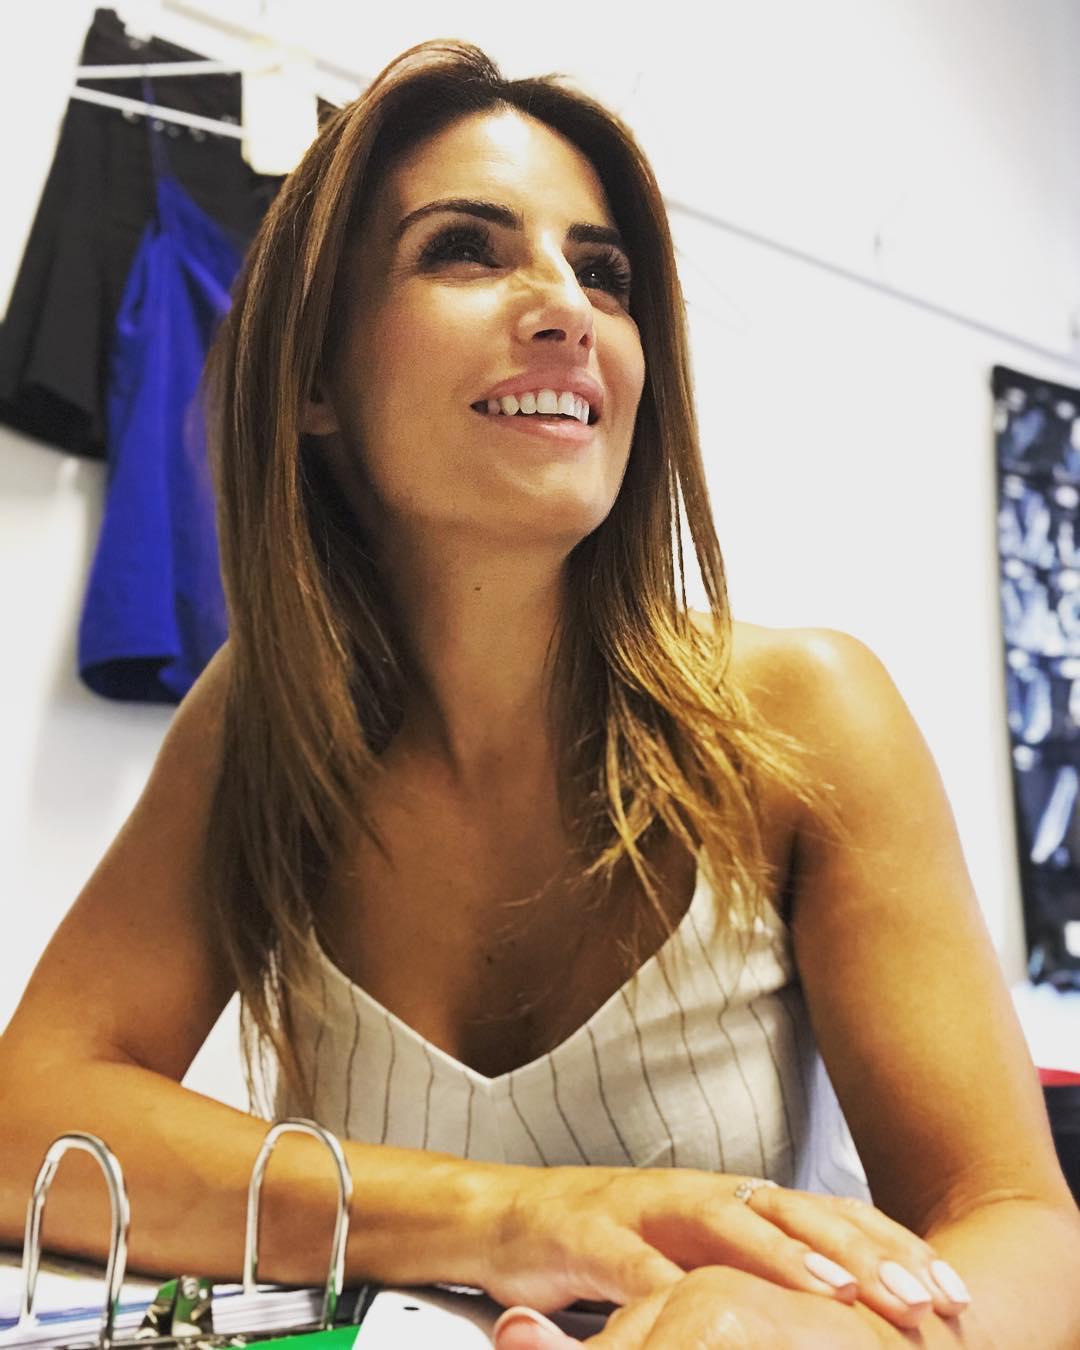 50 Hot Photos Of Ada Nicodemou - 12thBlog